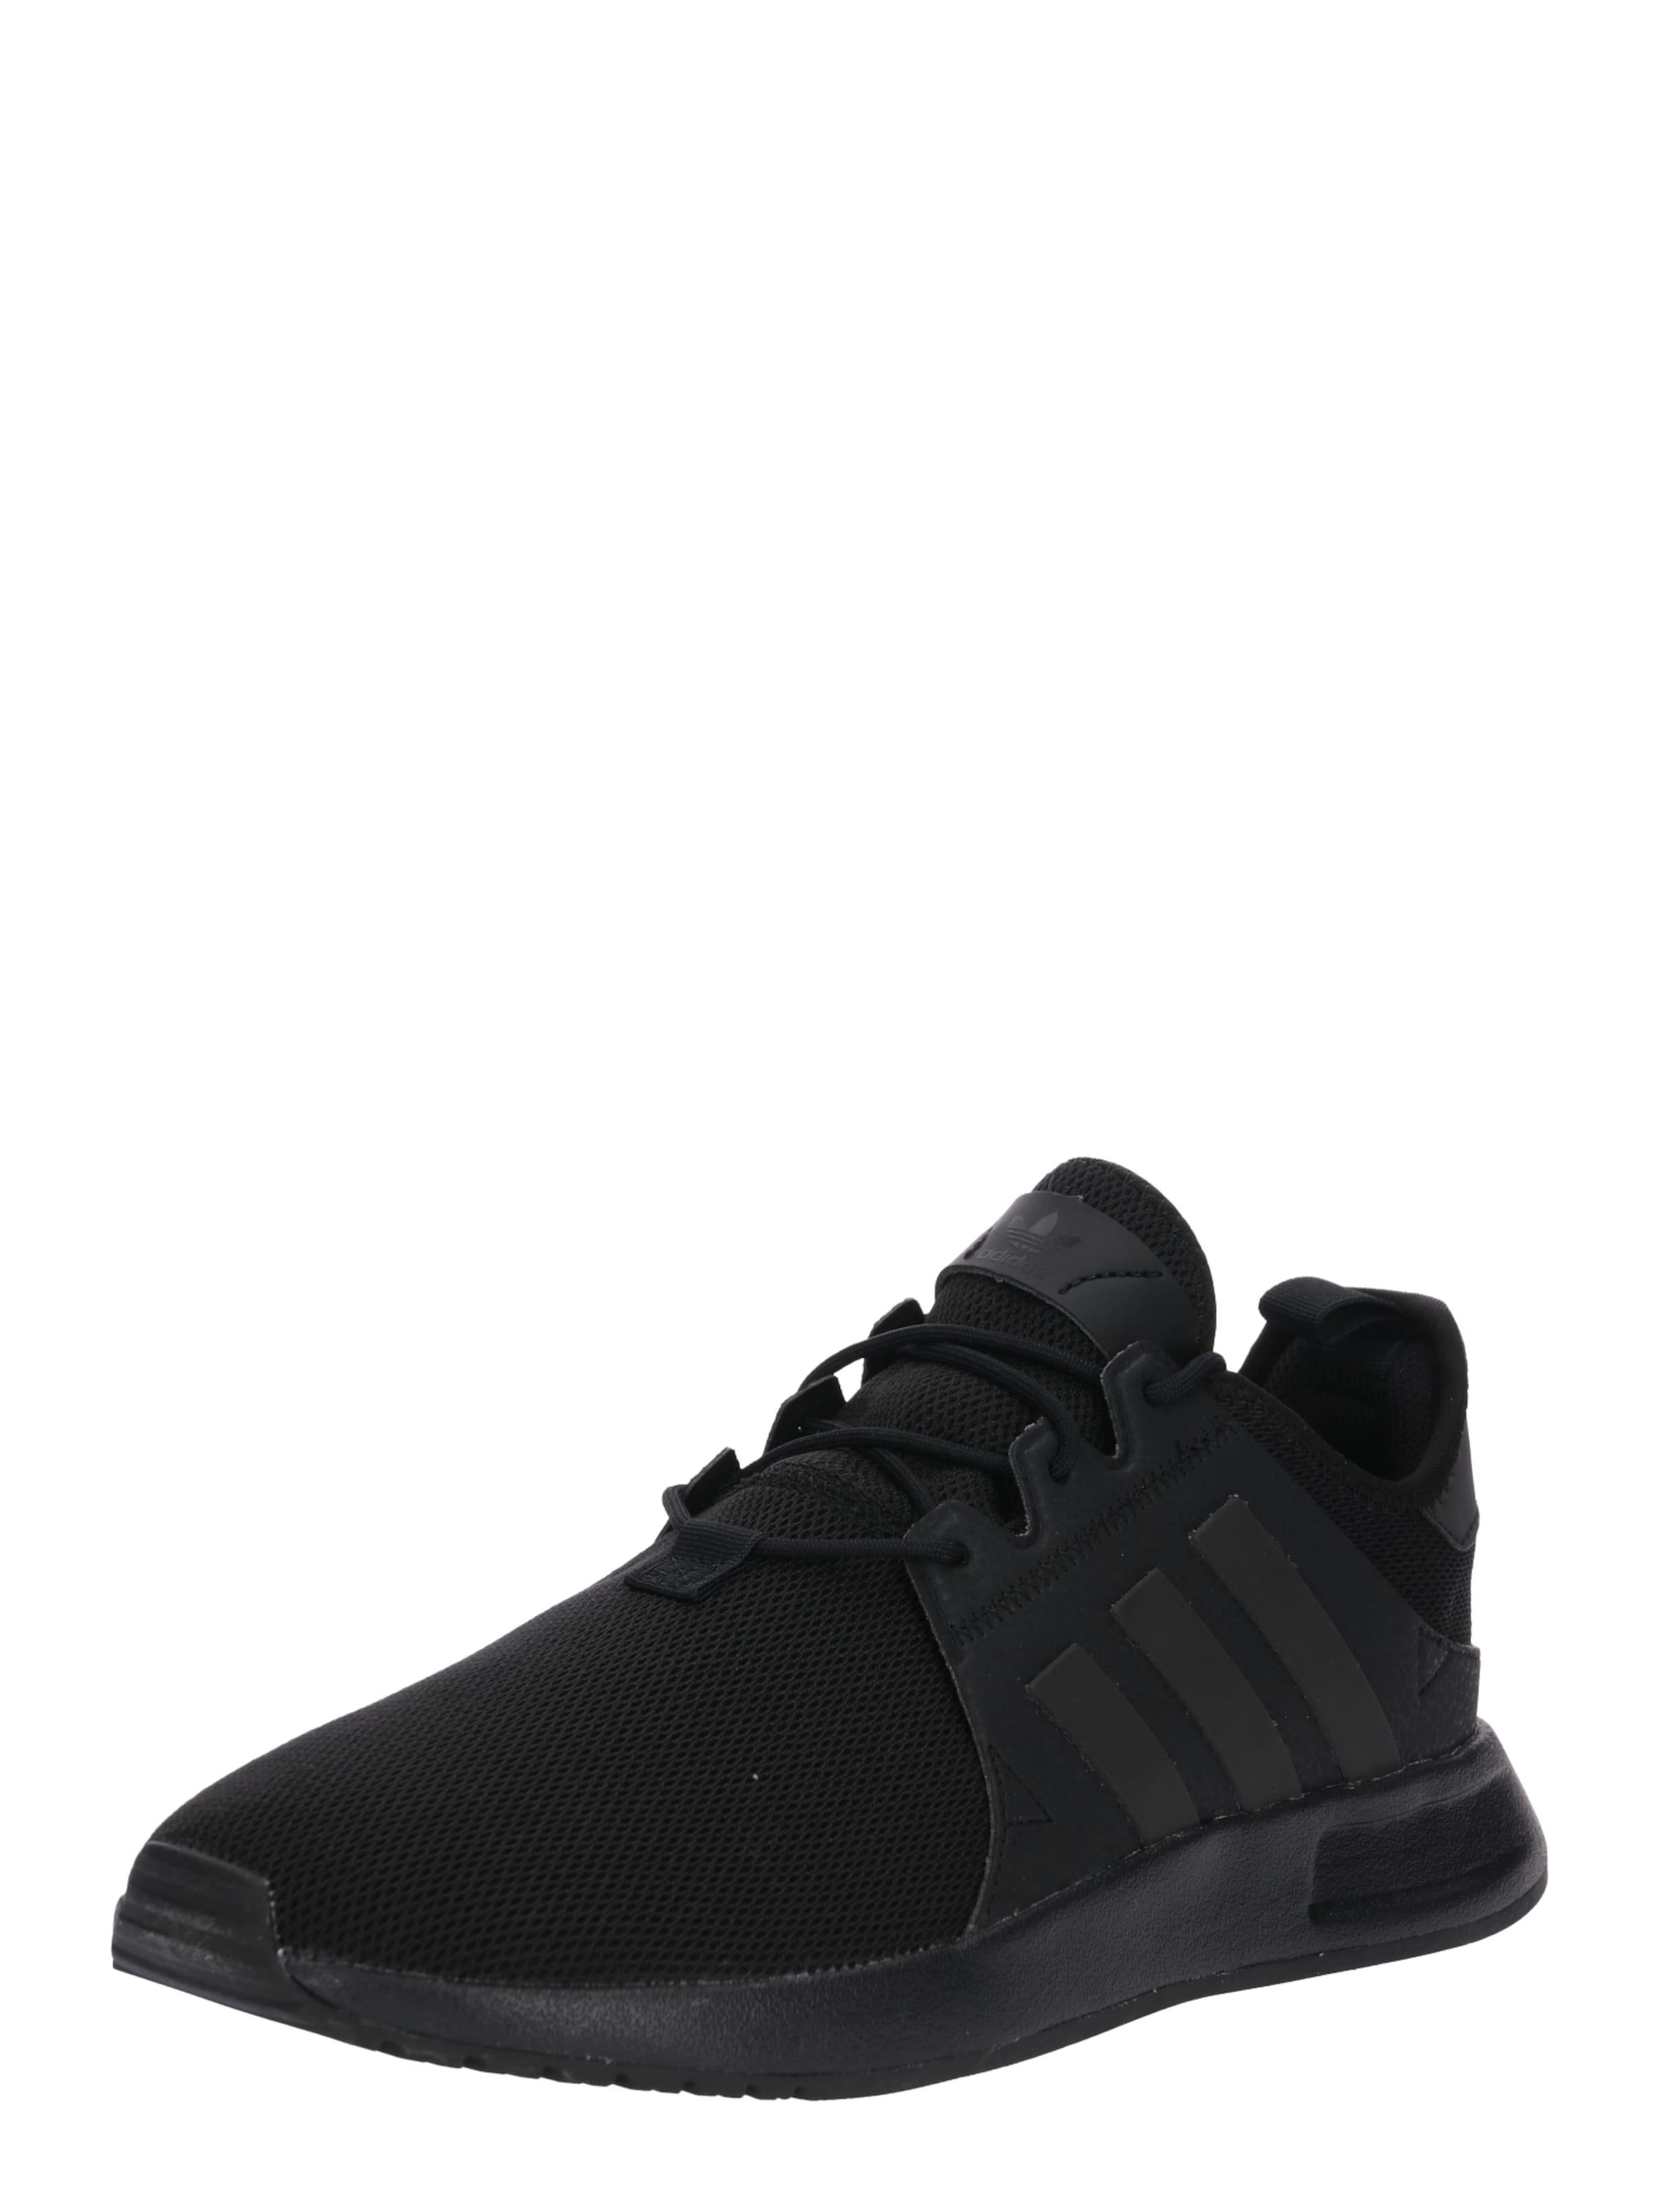 plr' Noir Originals Adidas Basses En Baskets 'x WE2DHIY9